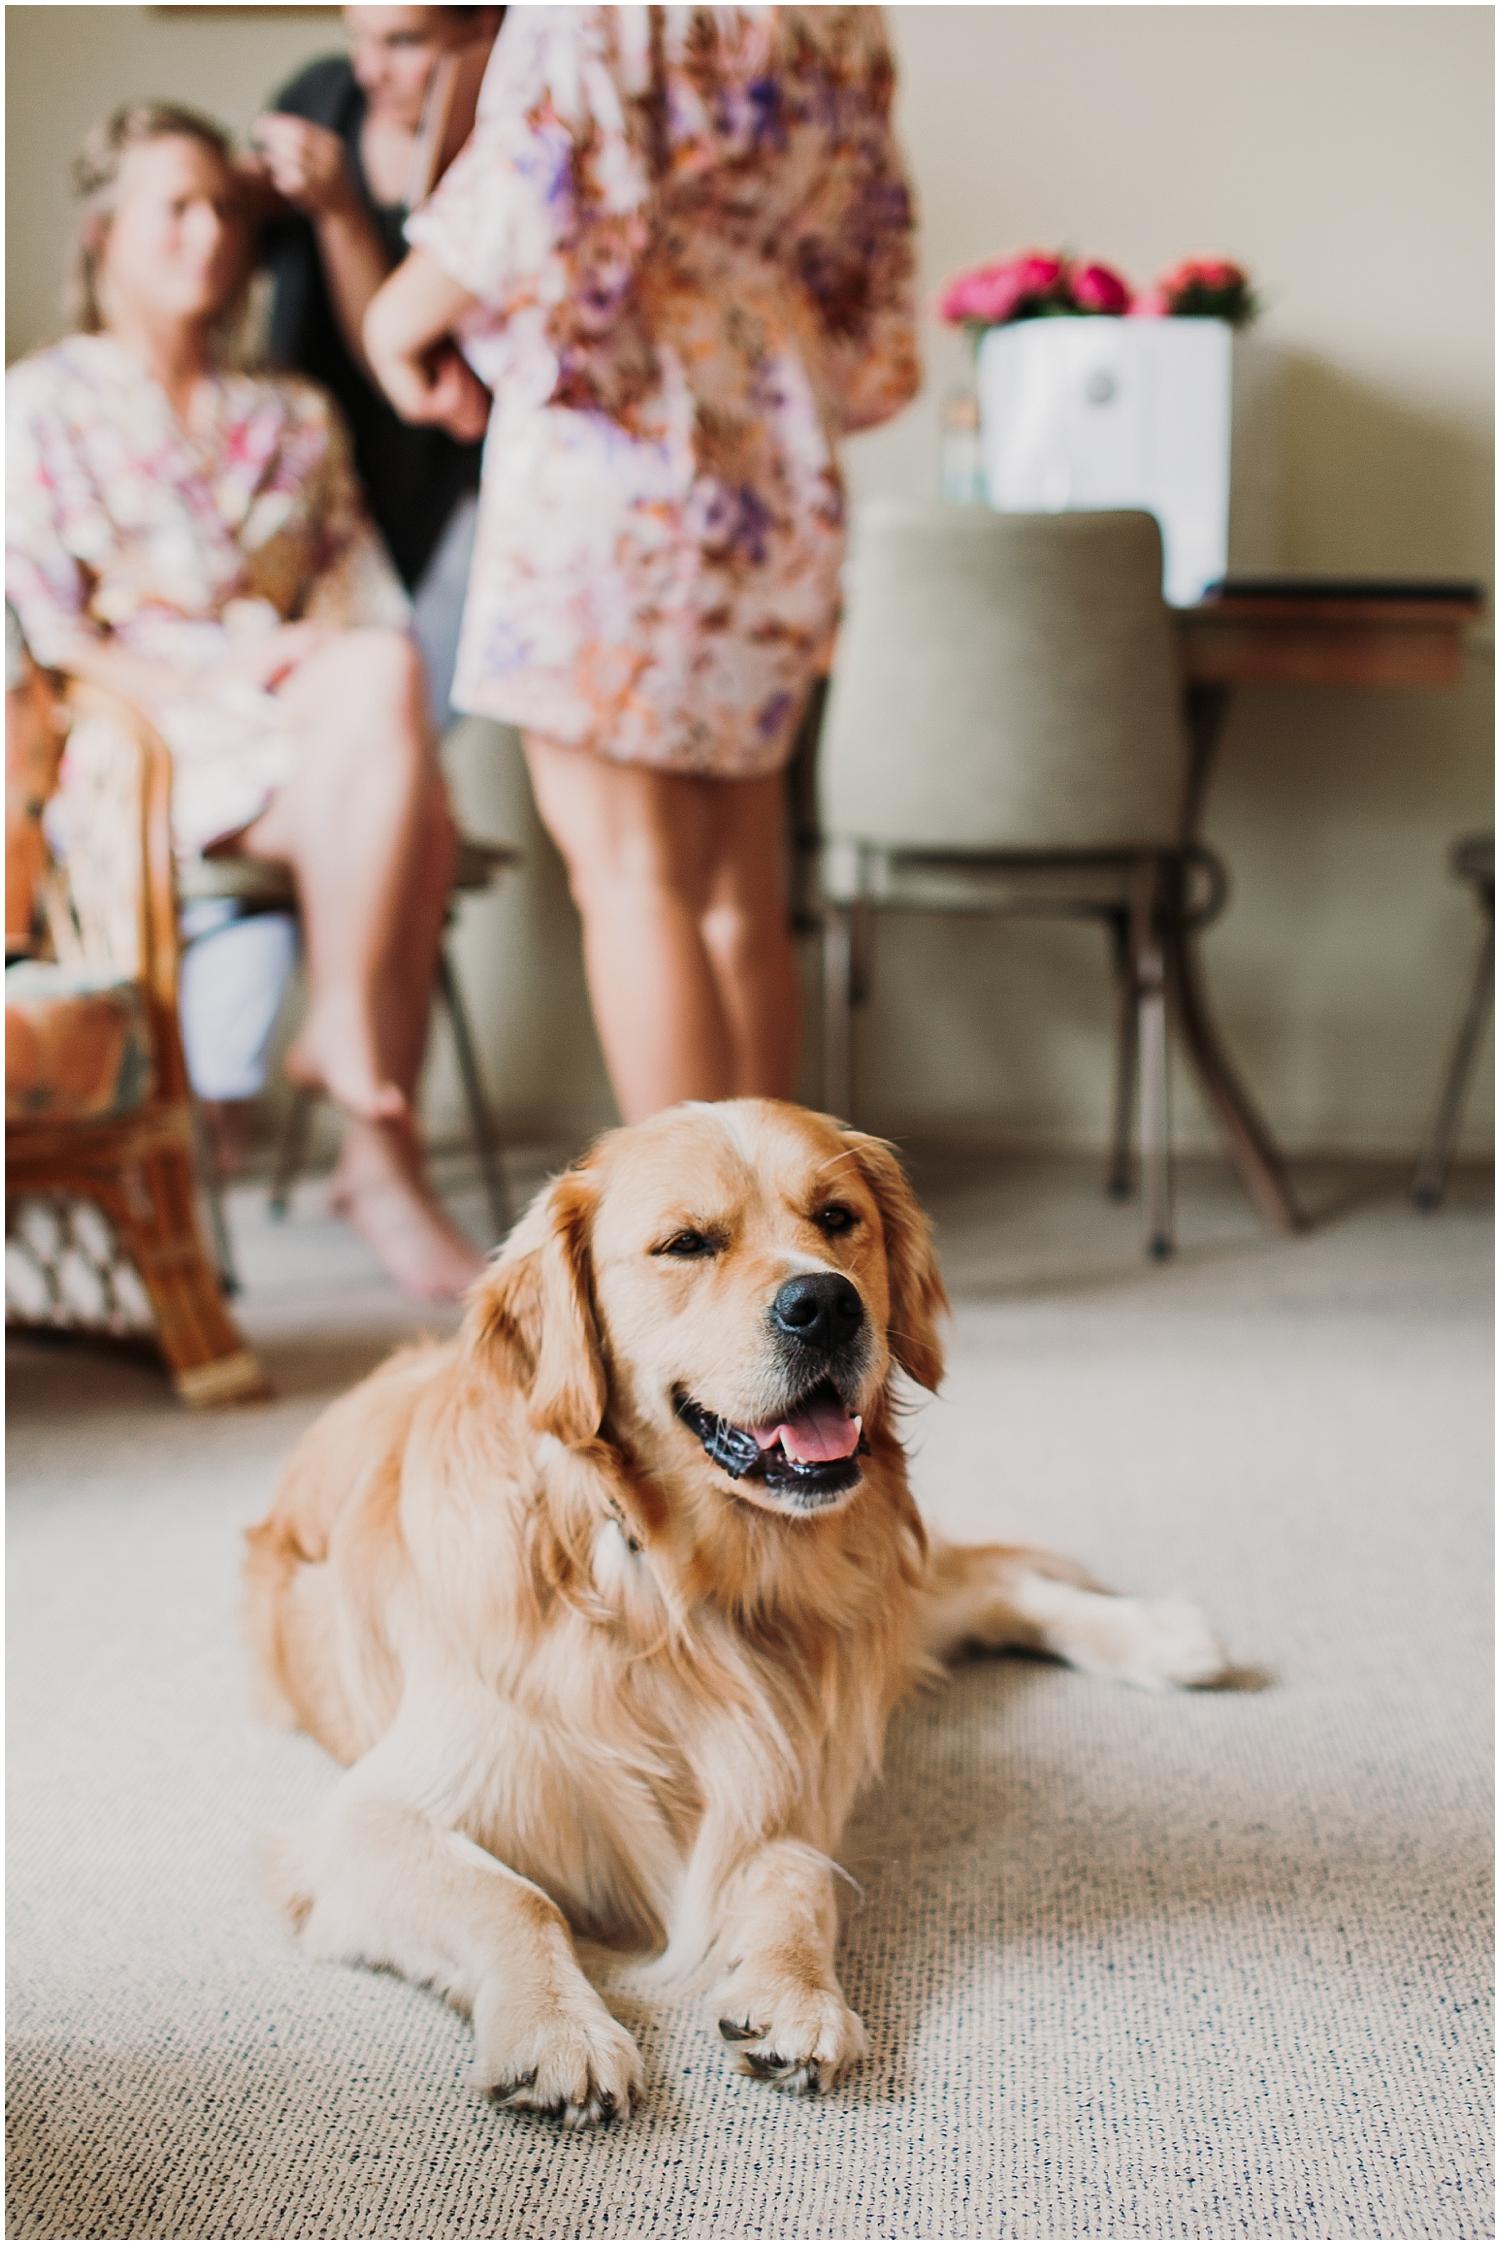 Hannah & Scotts Wedding - Darcy - Carmen Peter Photography